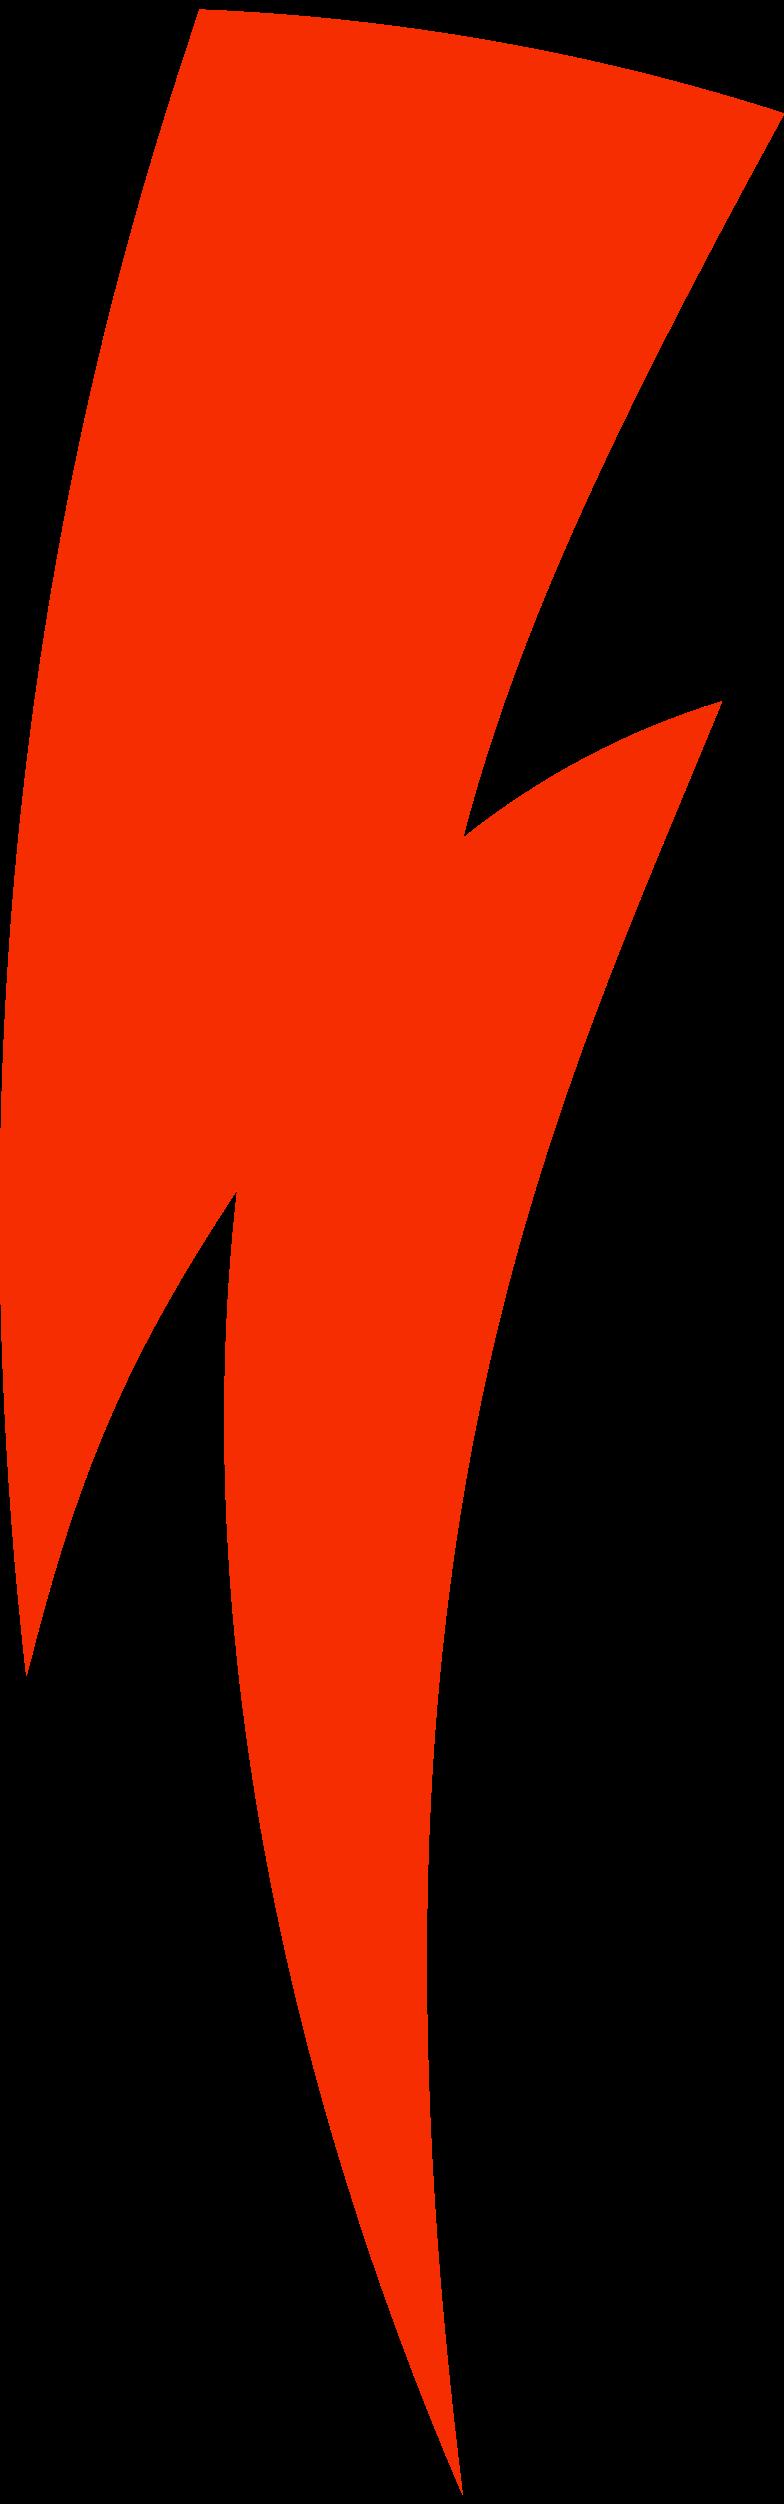 zipper Clipart illustration in PNG, SVG